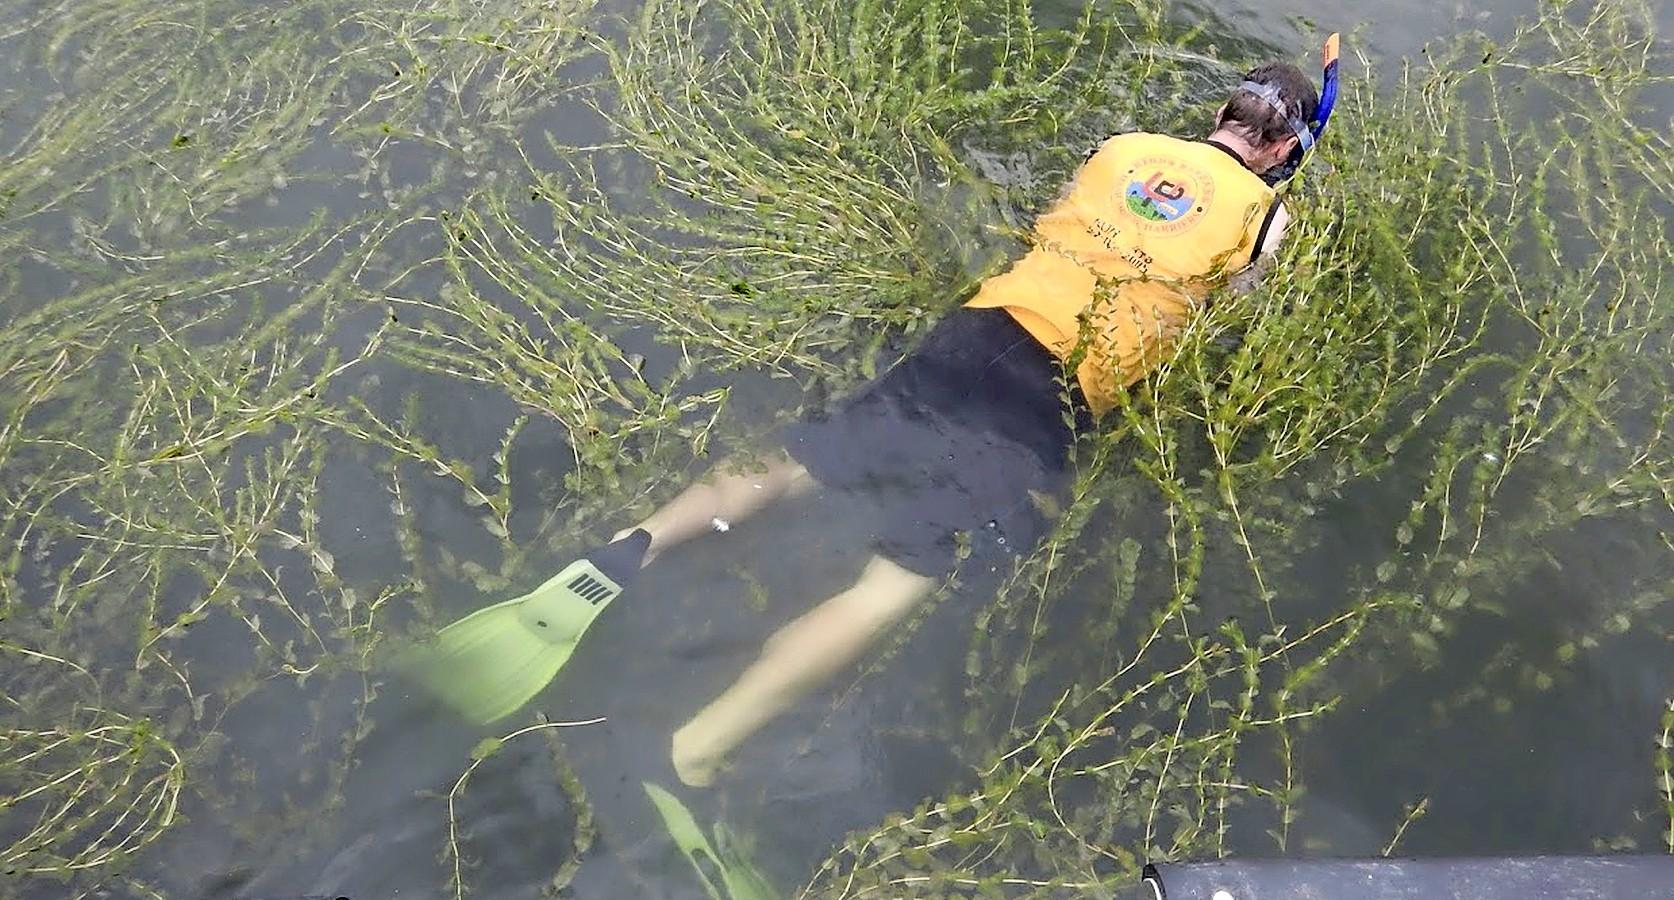 Harm en Arie omarmen het fonteinkruid: 'Waterplant is deel van ecosysteem Markermeer'